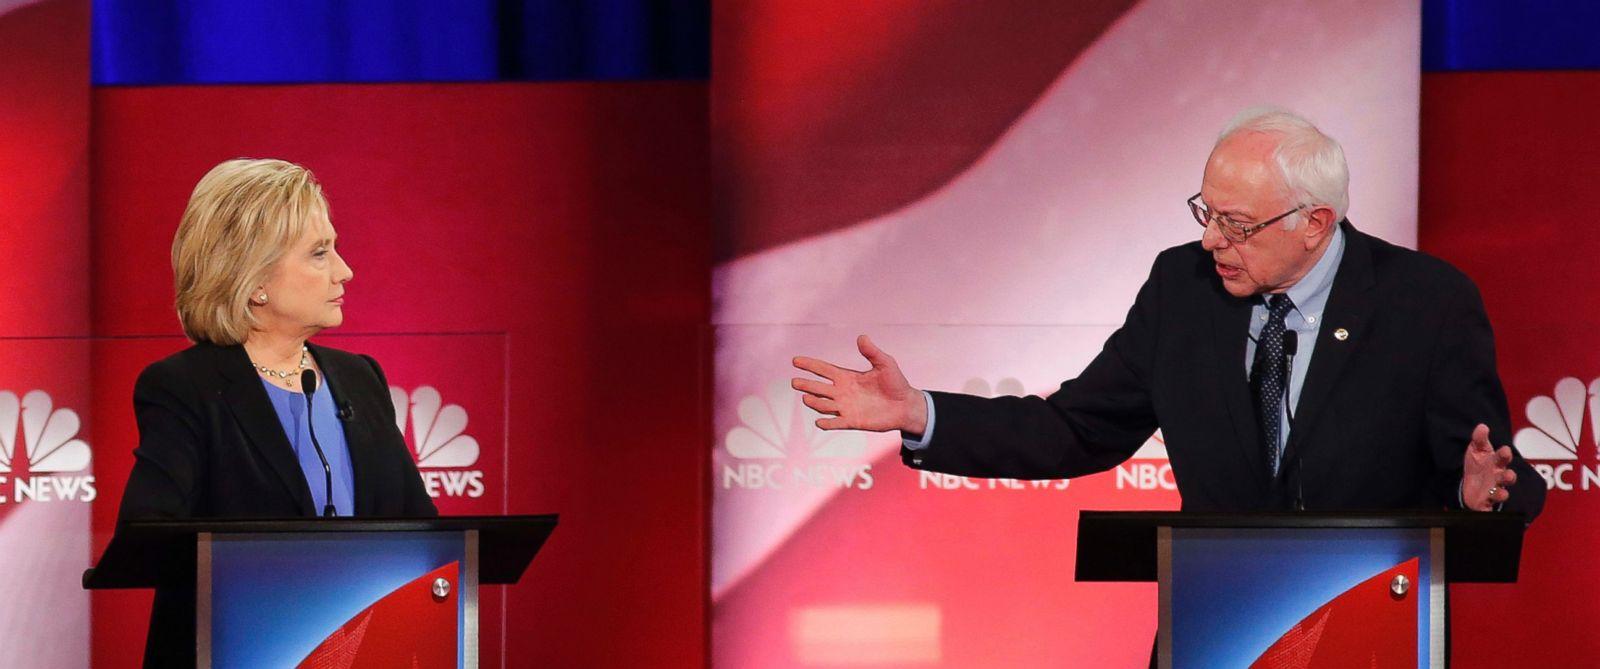 PHOTO: Sen. Bernie Sanders, gestures towards former Secretary of State Hillary Clinton during a democratic presidential primary debate at the Gaillard Center, Jan. 17, 2016, in Charleston, S.C.